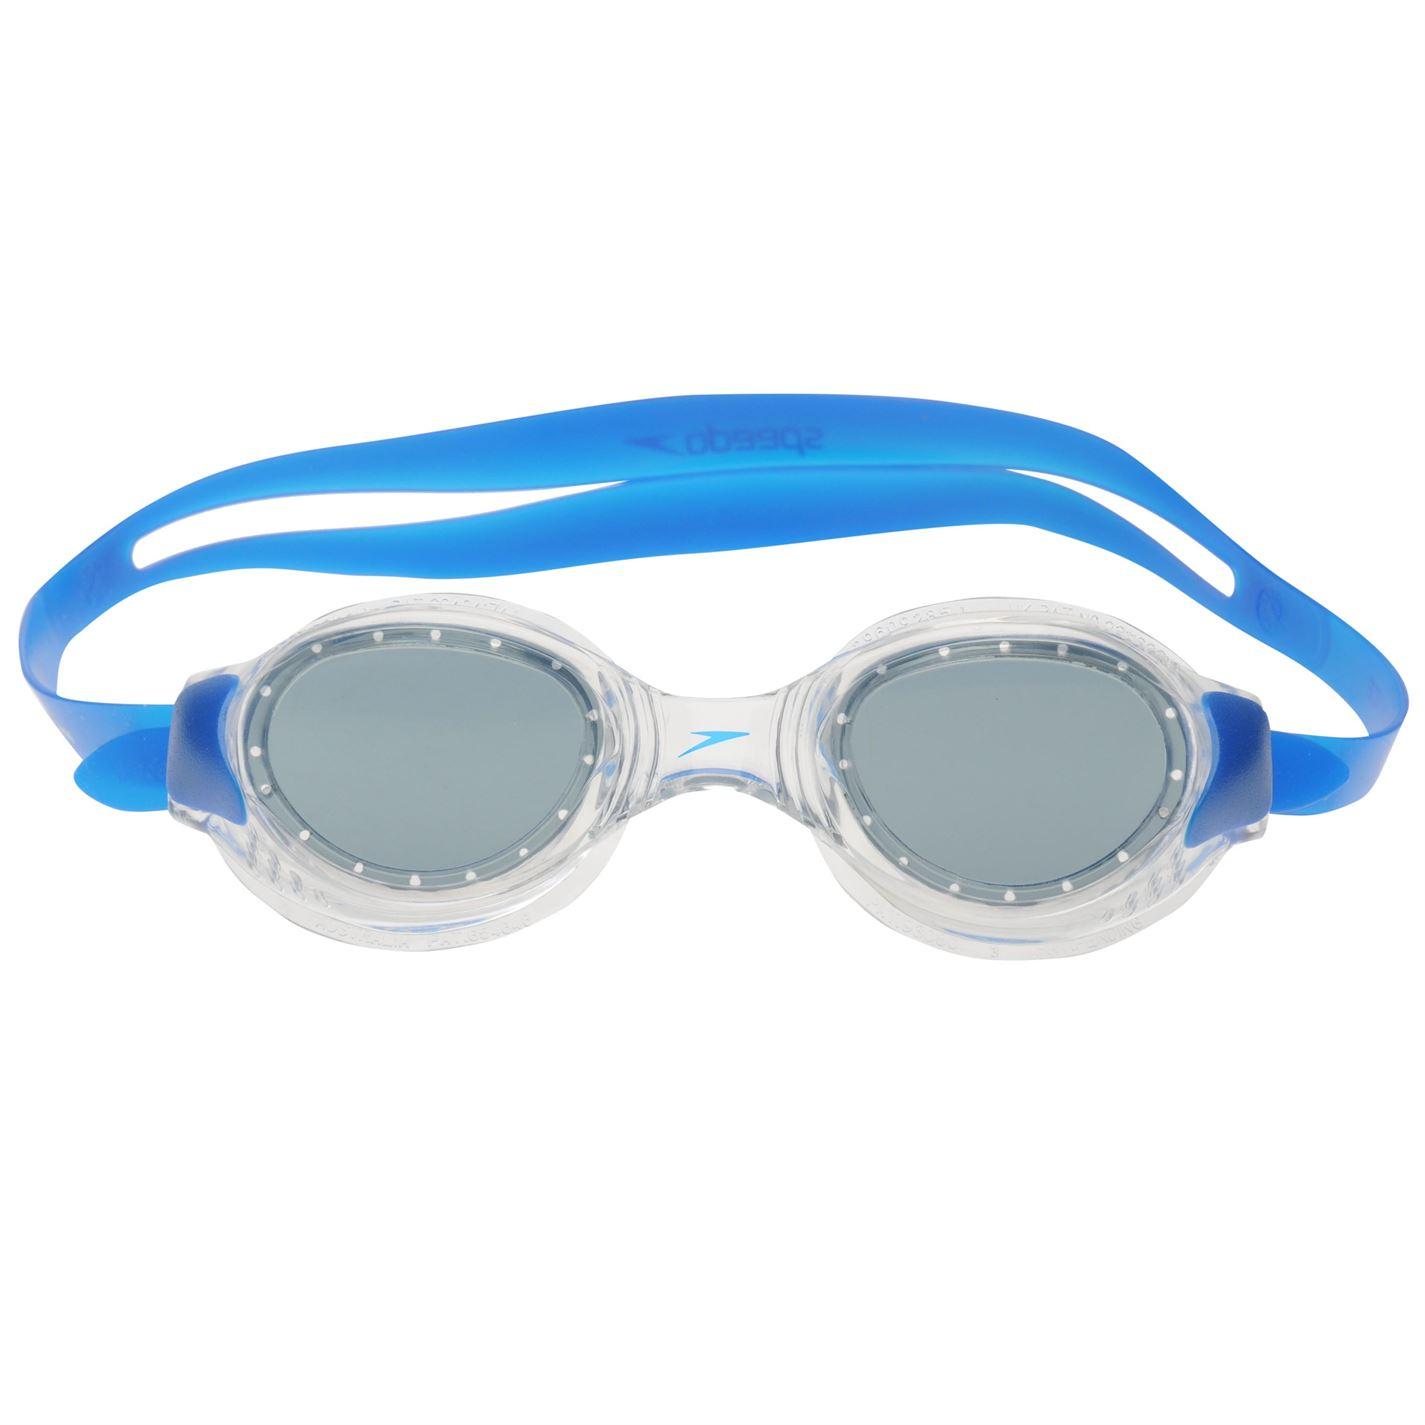 Speedo Futura Ice Goggles